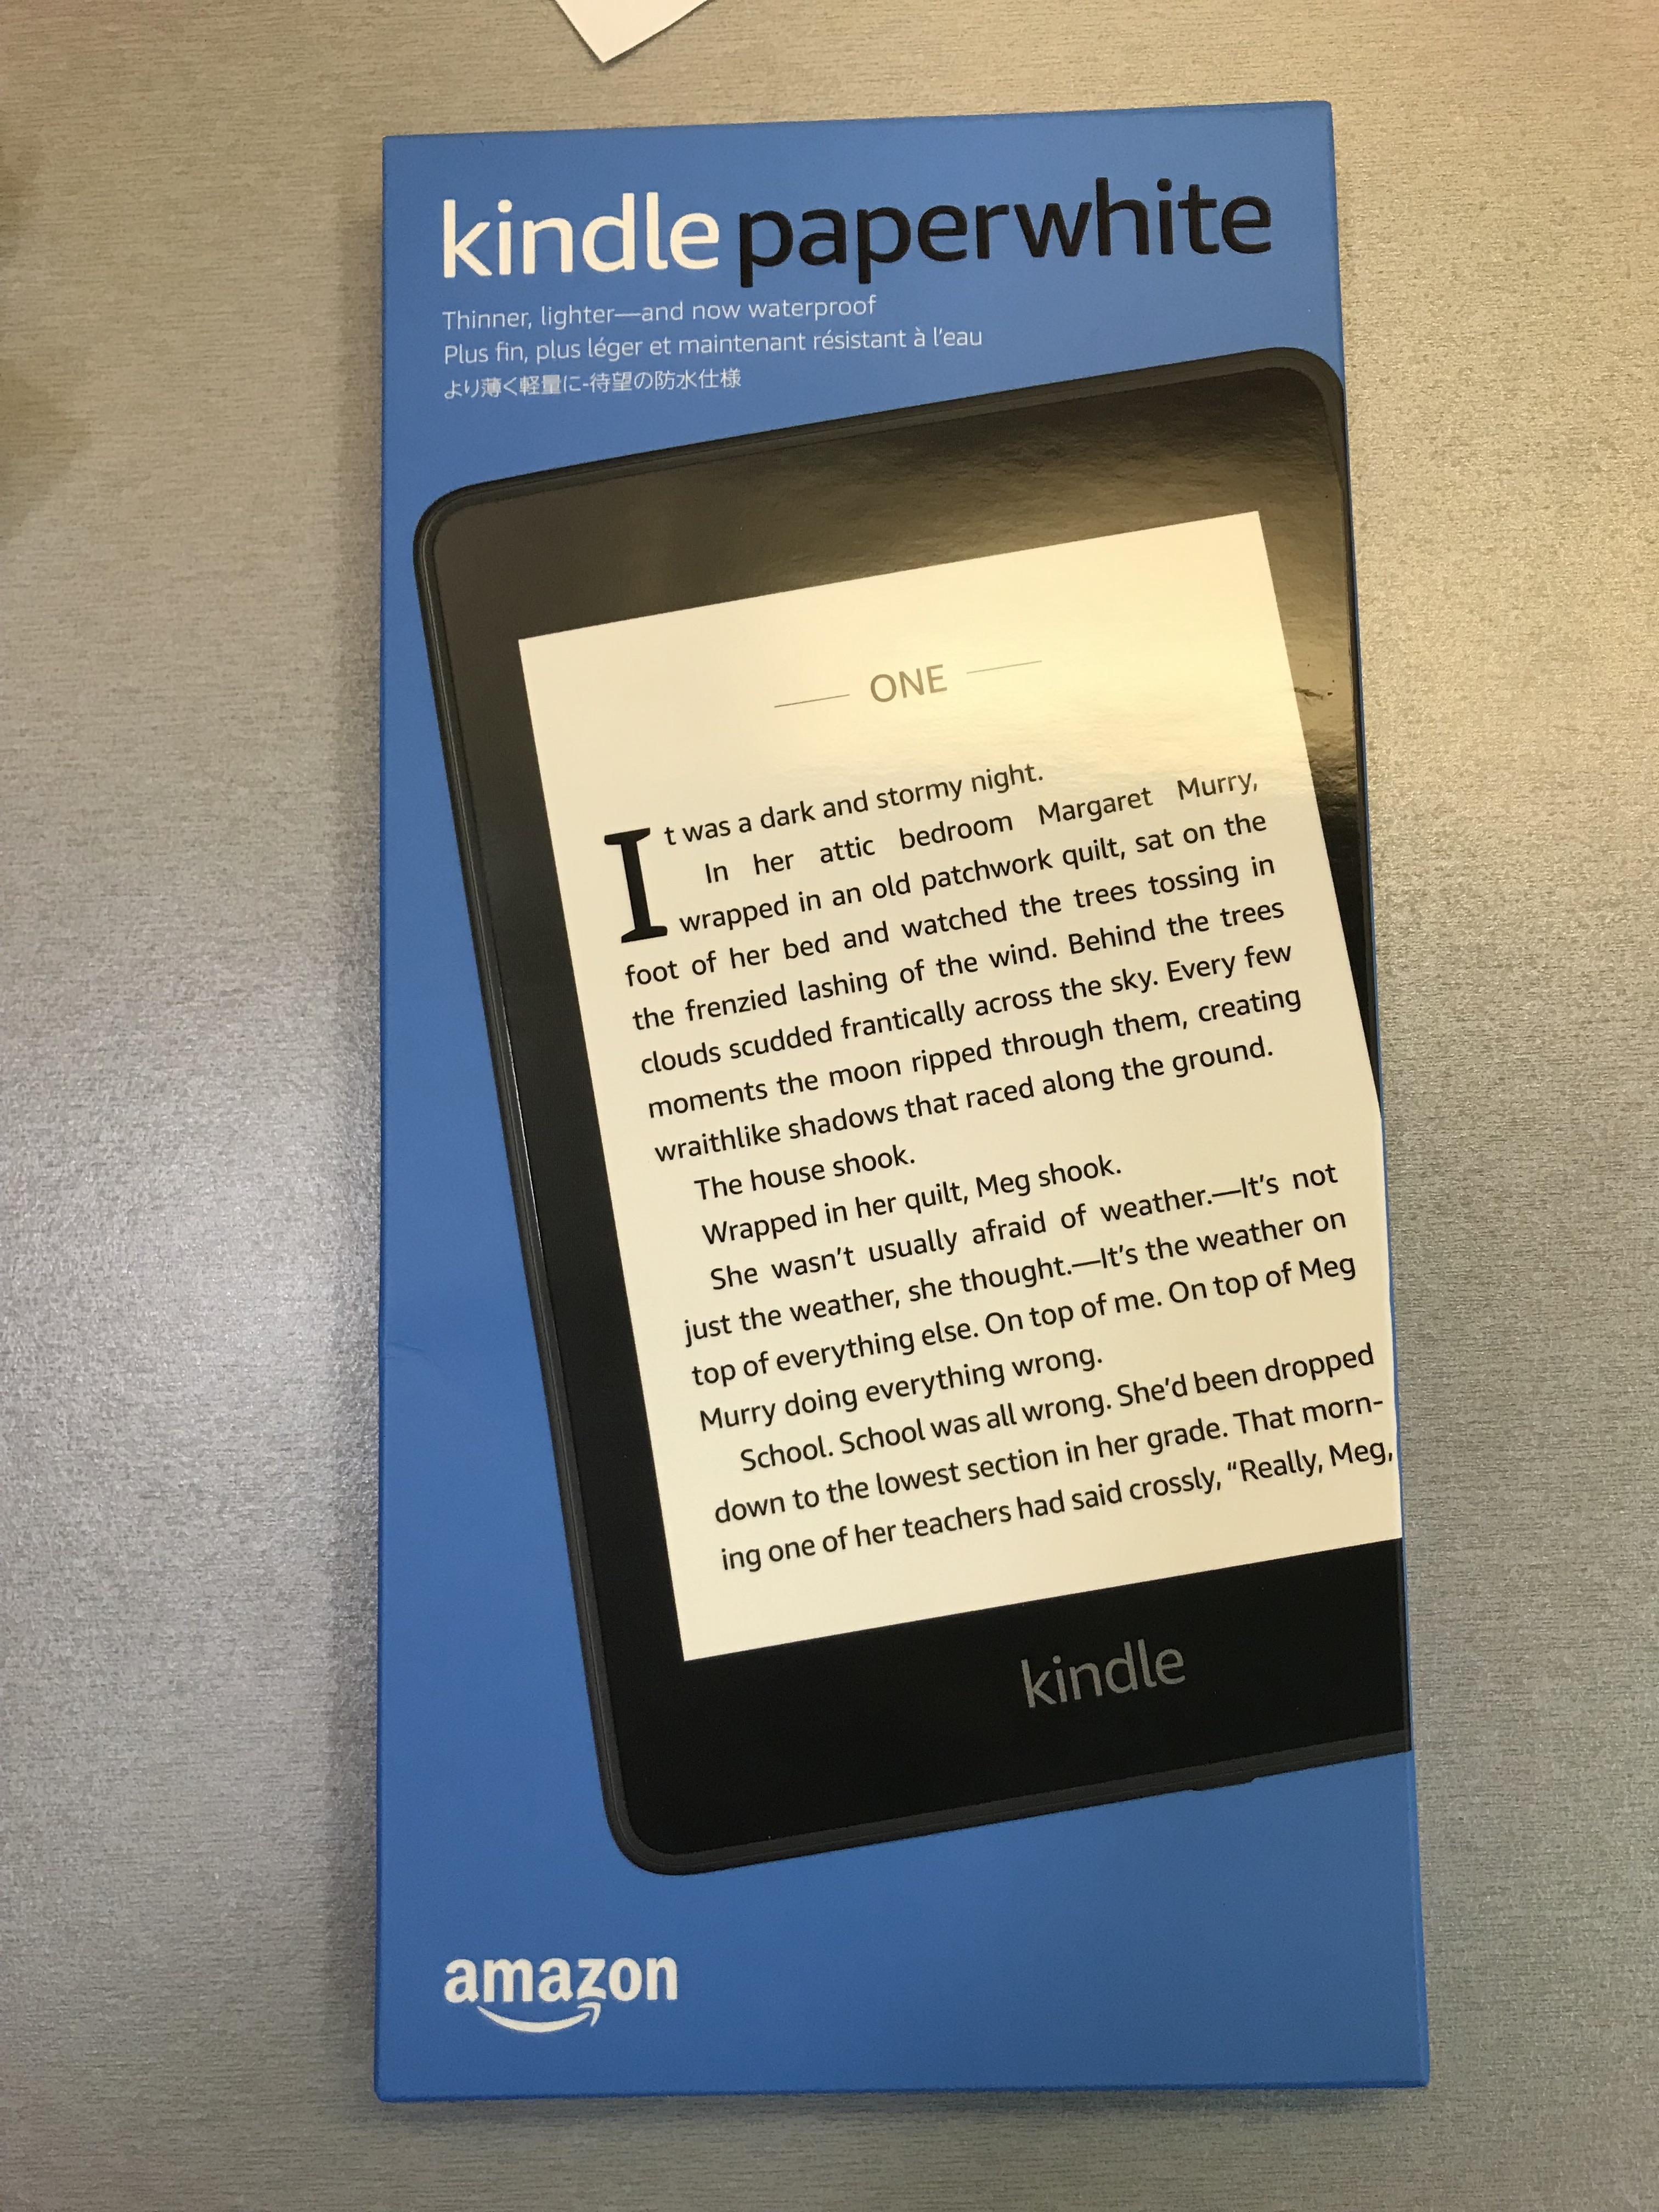 電子書閱讀器-kindle paperwhite初體驗 – CHnieh